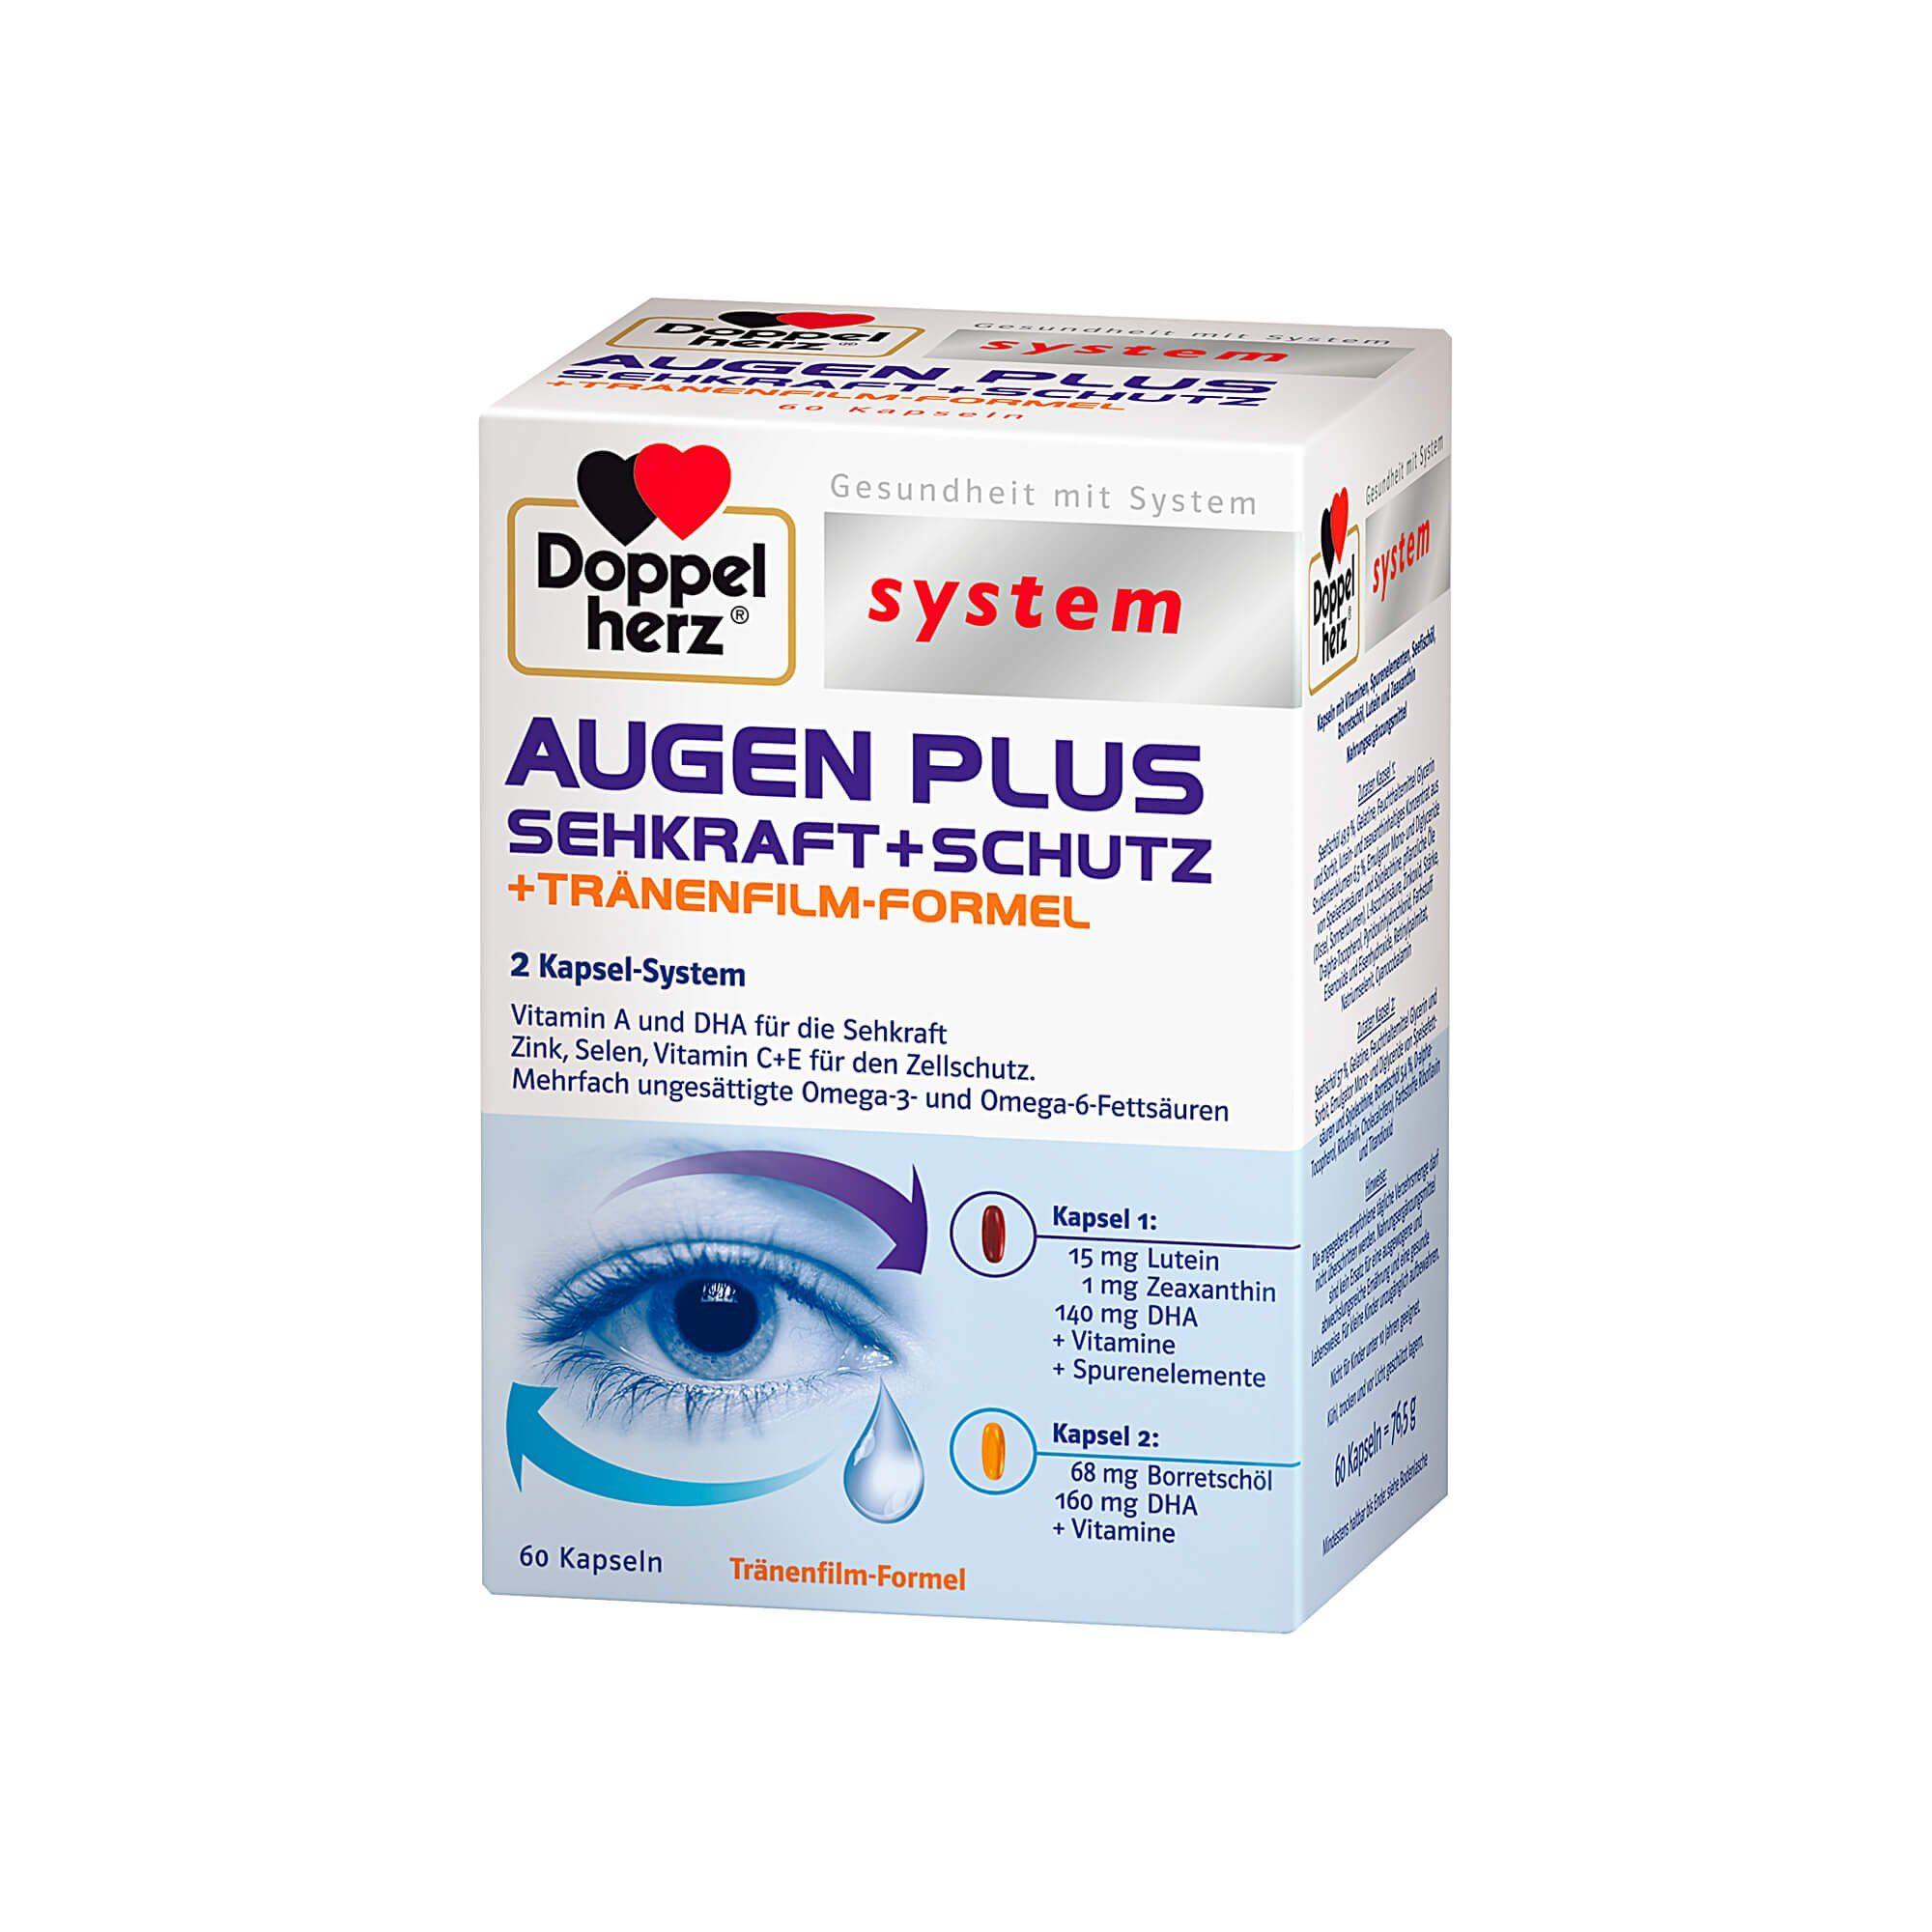 Doppelherz System Augen Plus system, 60 St